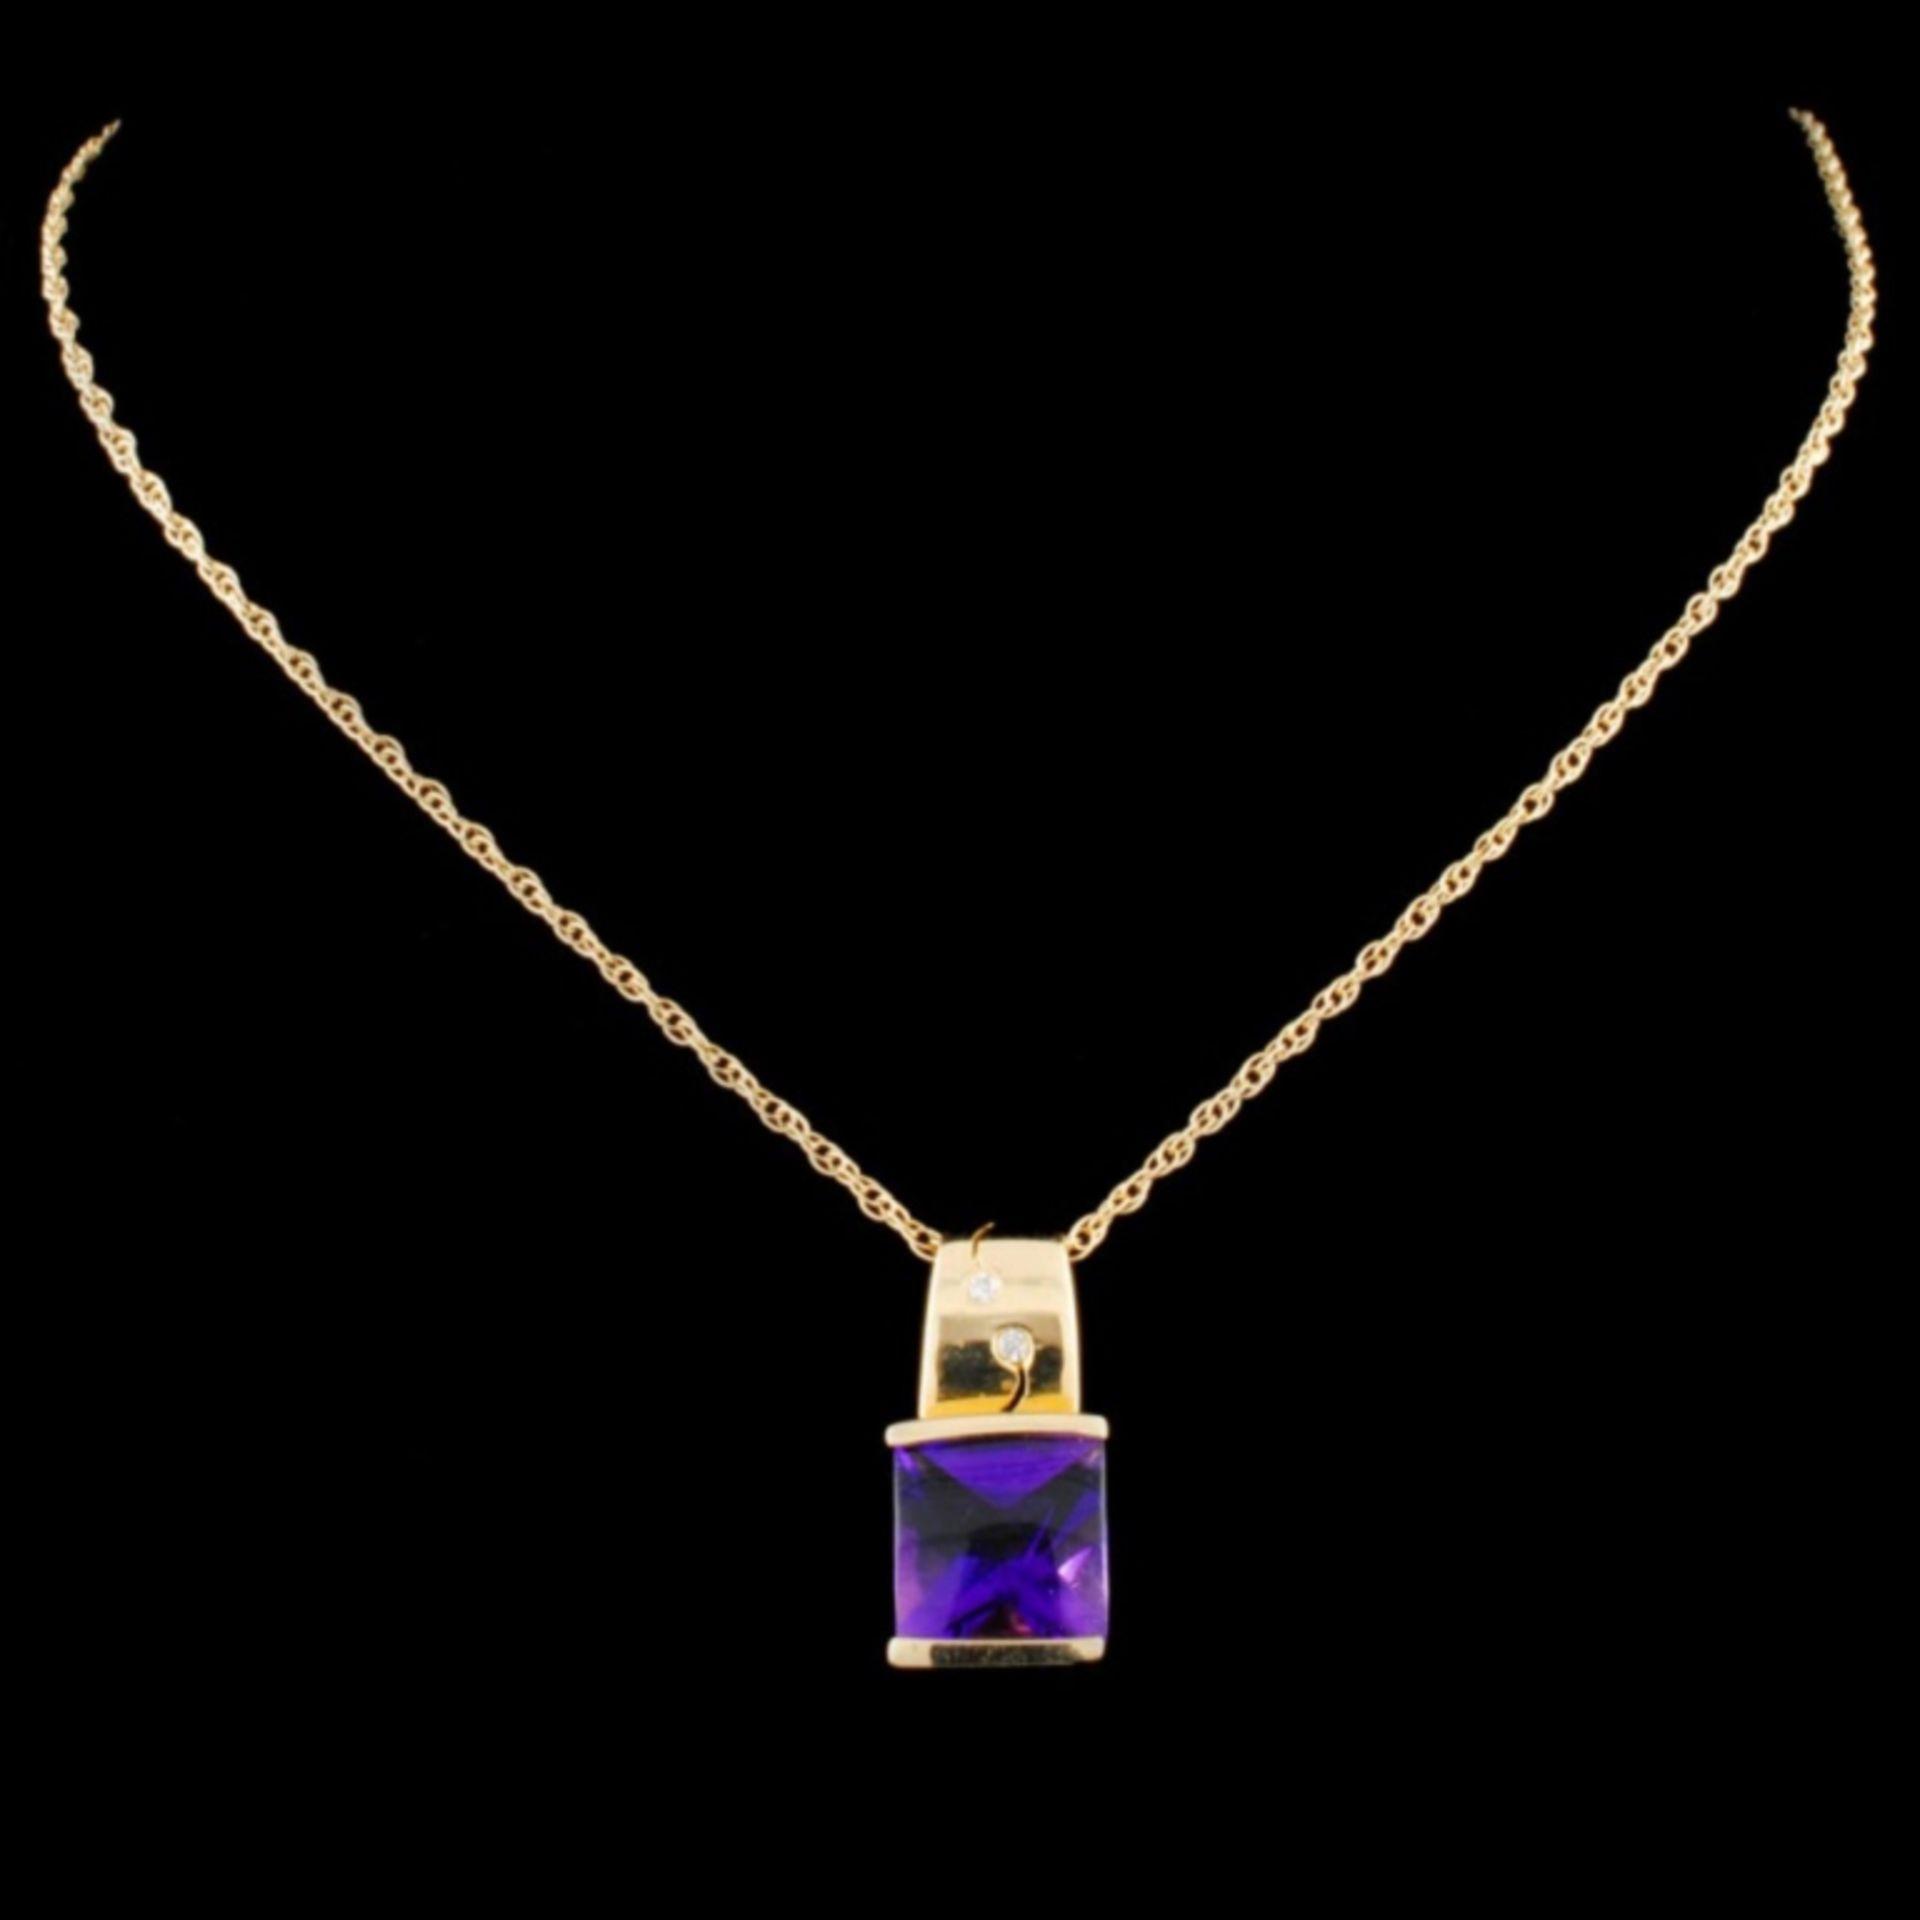 14K Gold 2.50ct Amethyst & 0.03ctw Diamond Pendant - Image 2 of 2